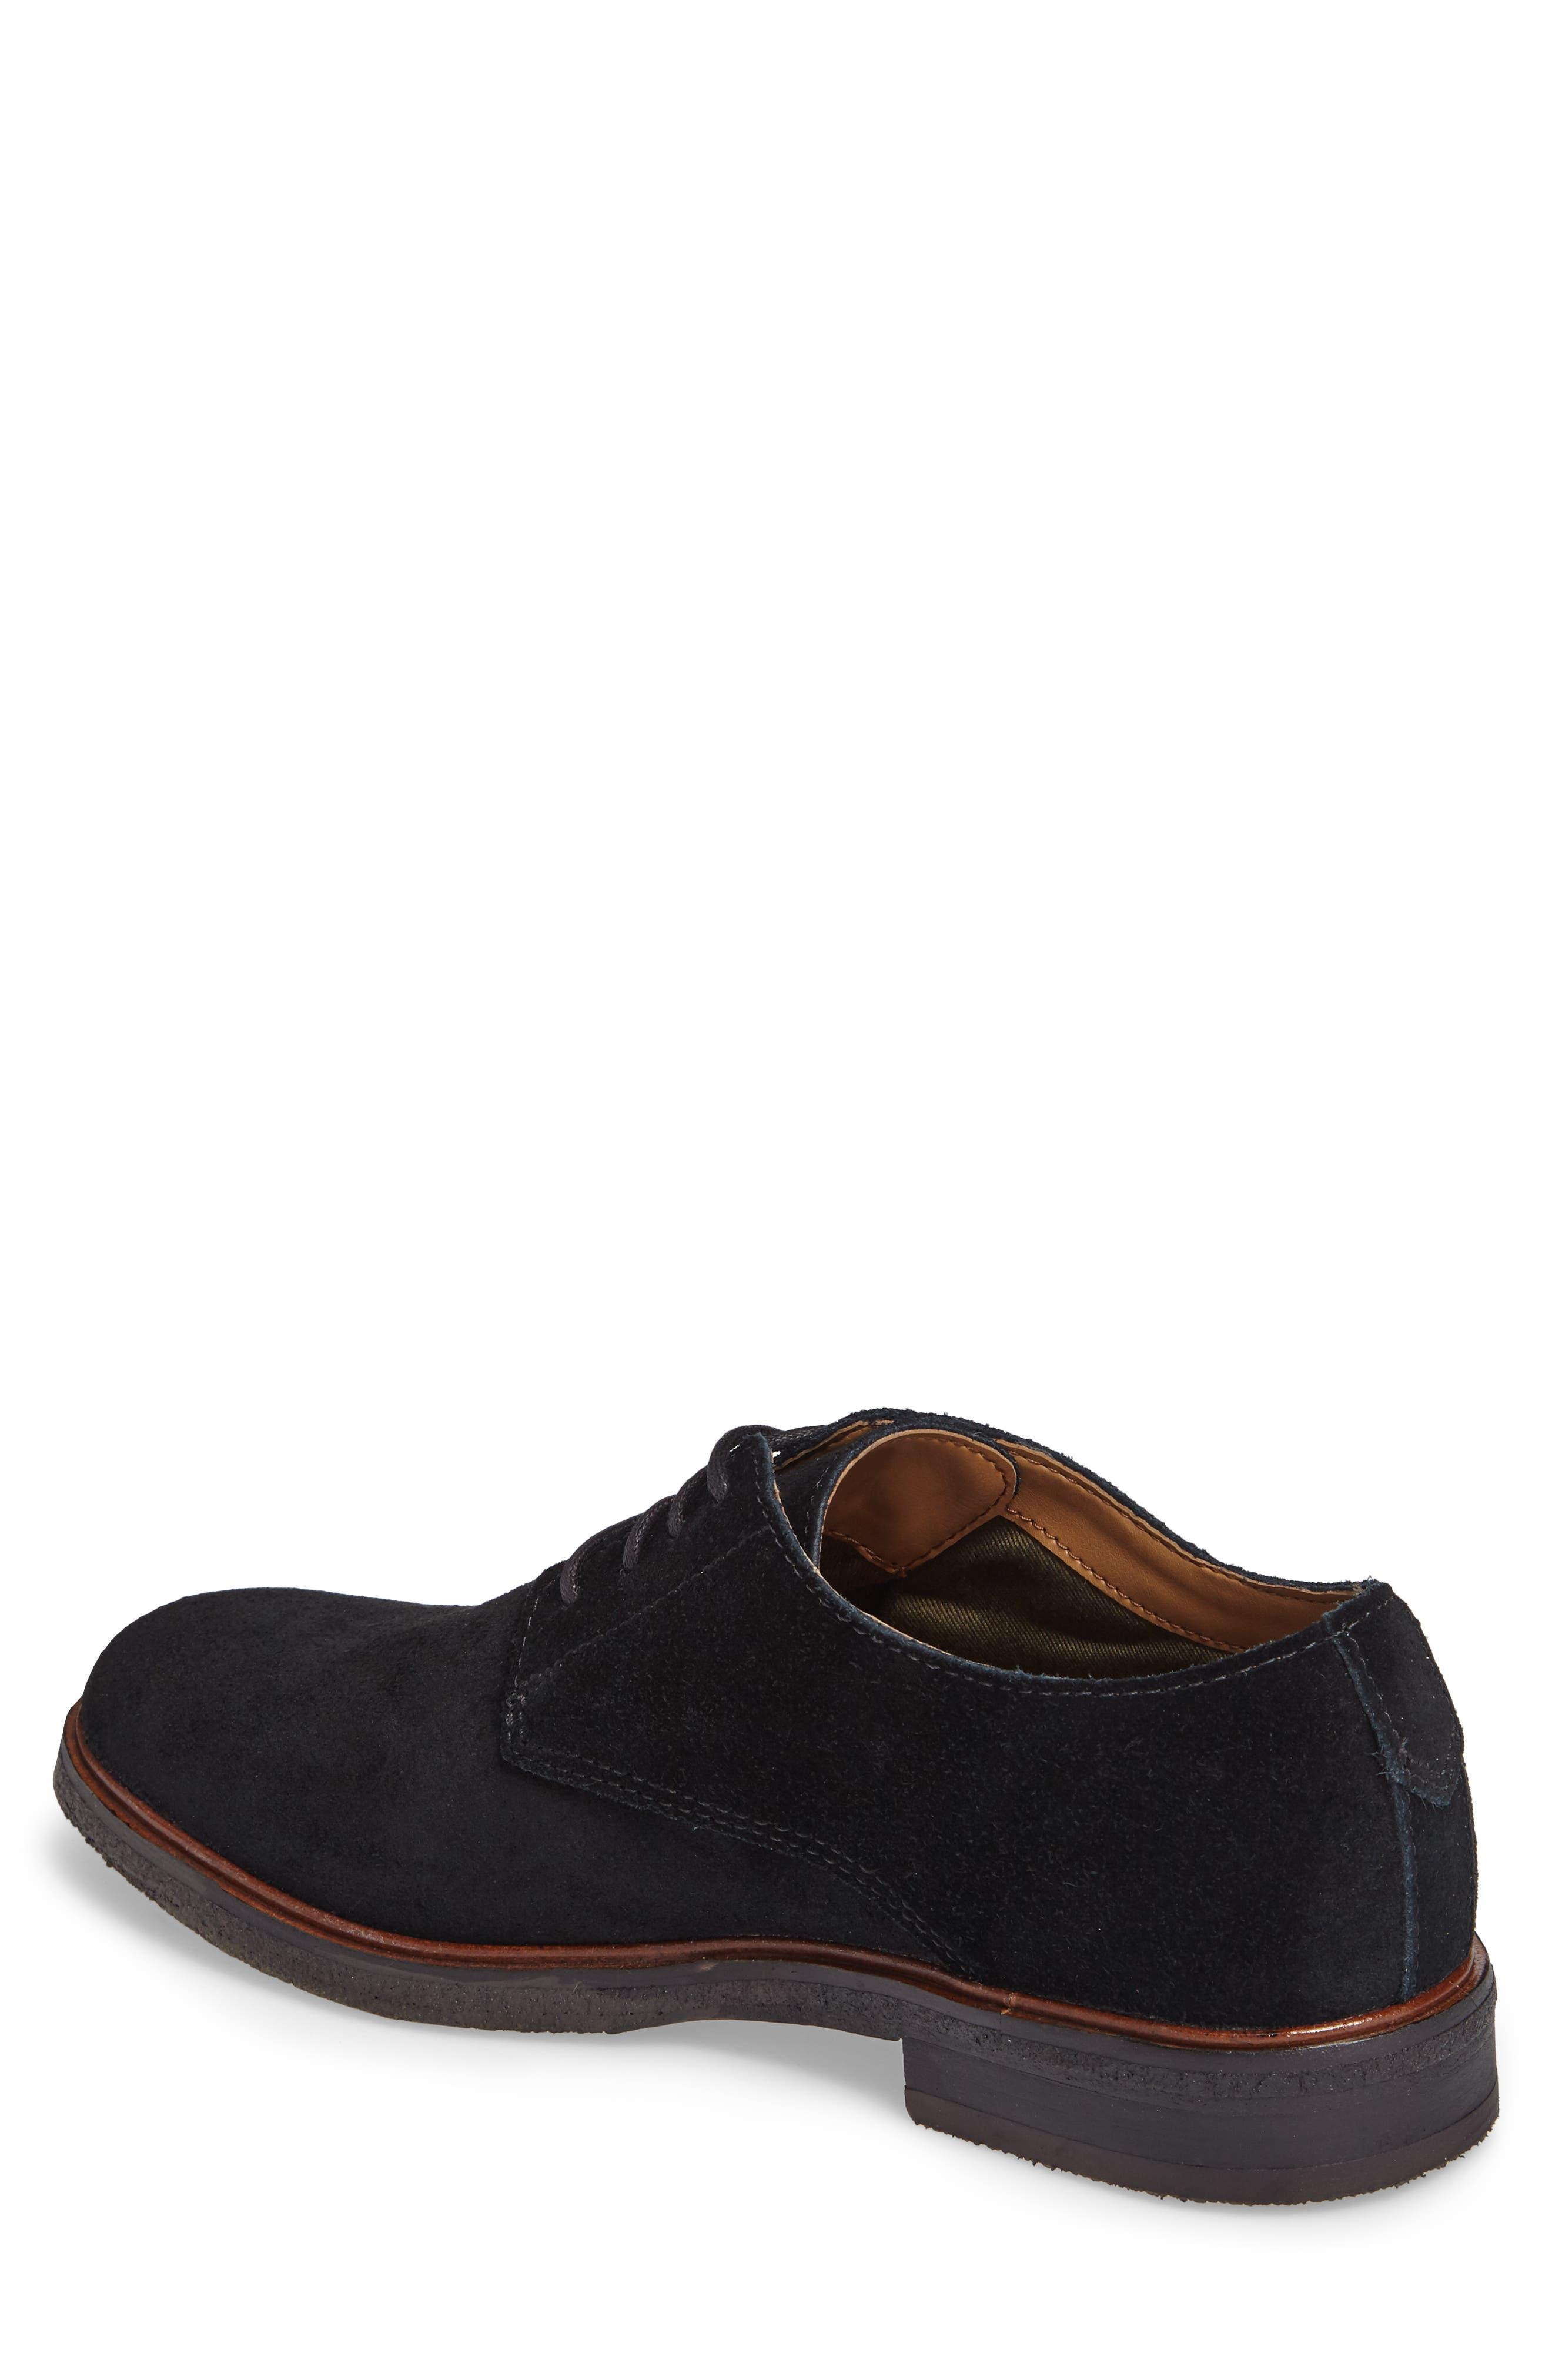 Clarks Clarkdale Moon Buck Shoe,                             Alternate thumbnail 2, color,                             Black Suede